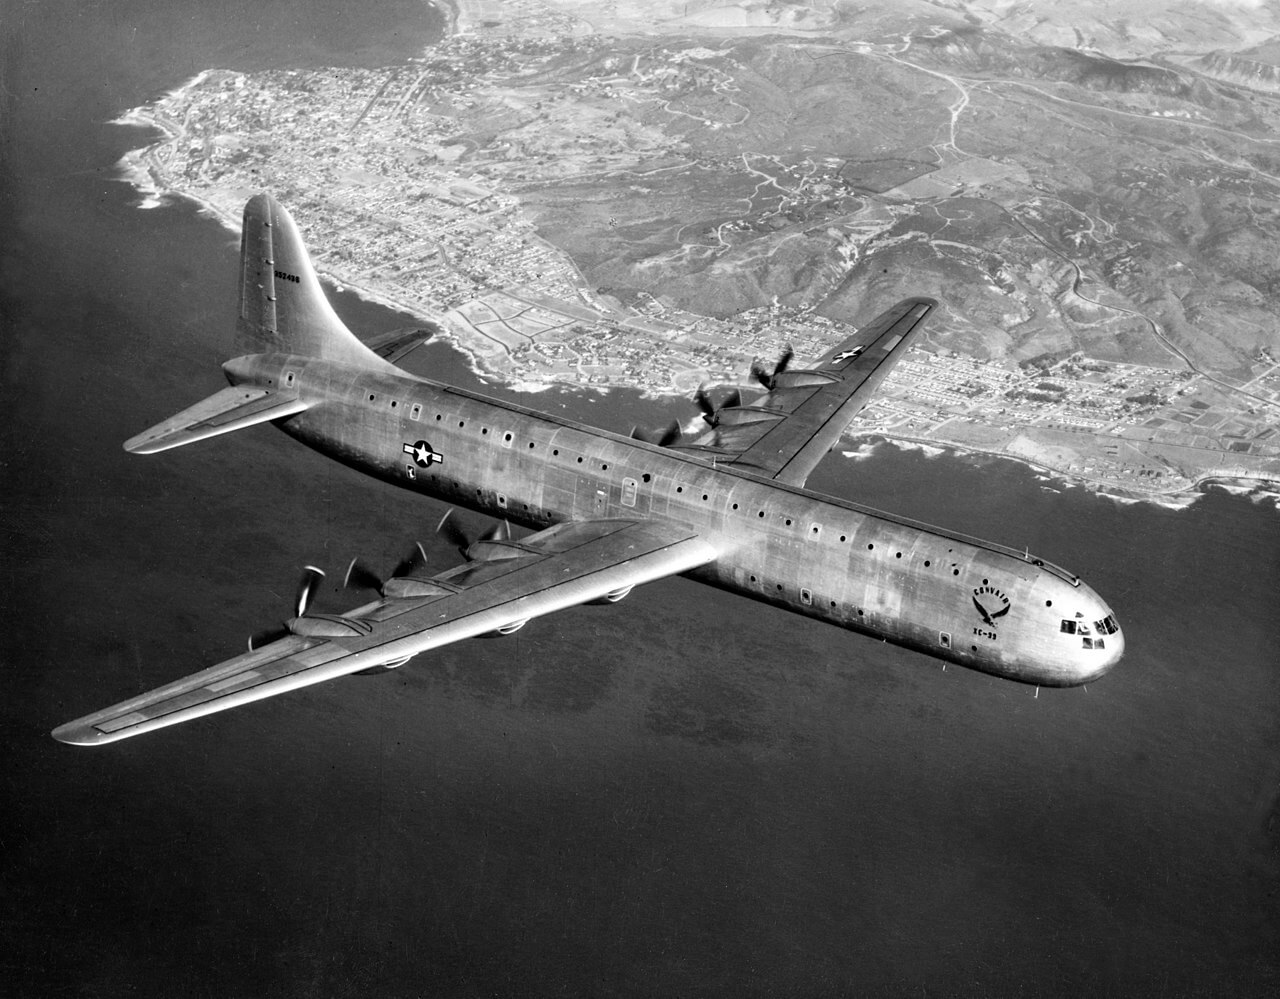 Flight Manual for the Convair XC-99